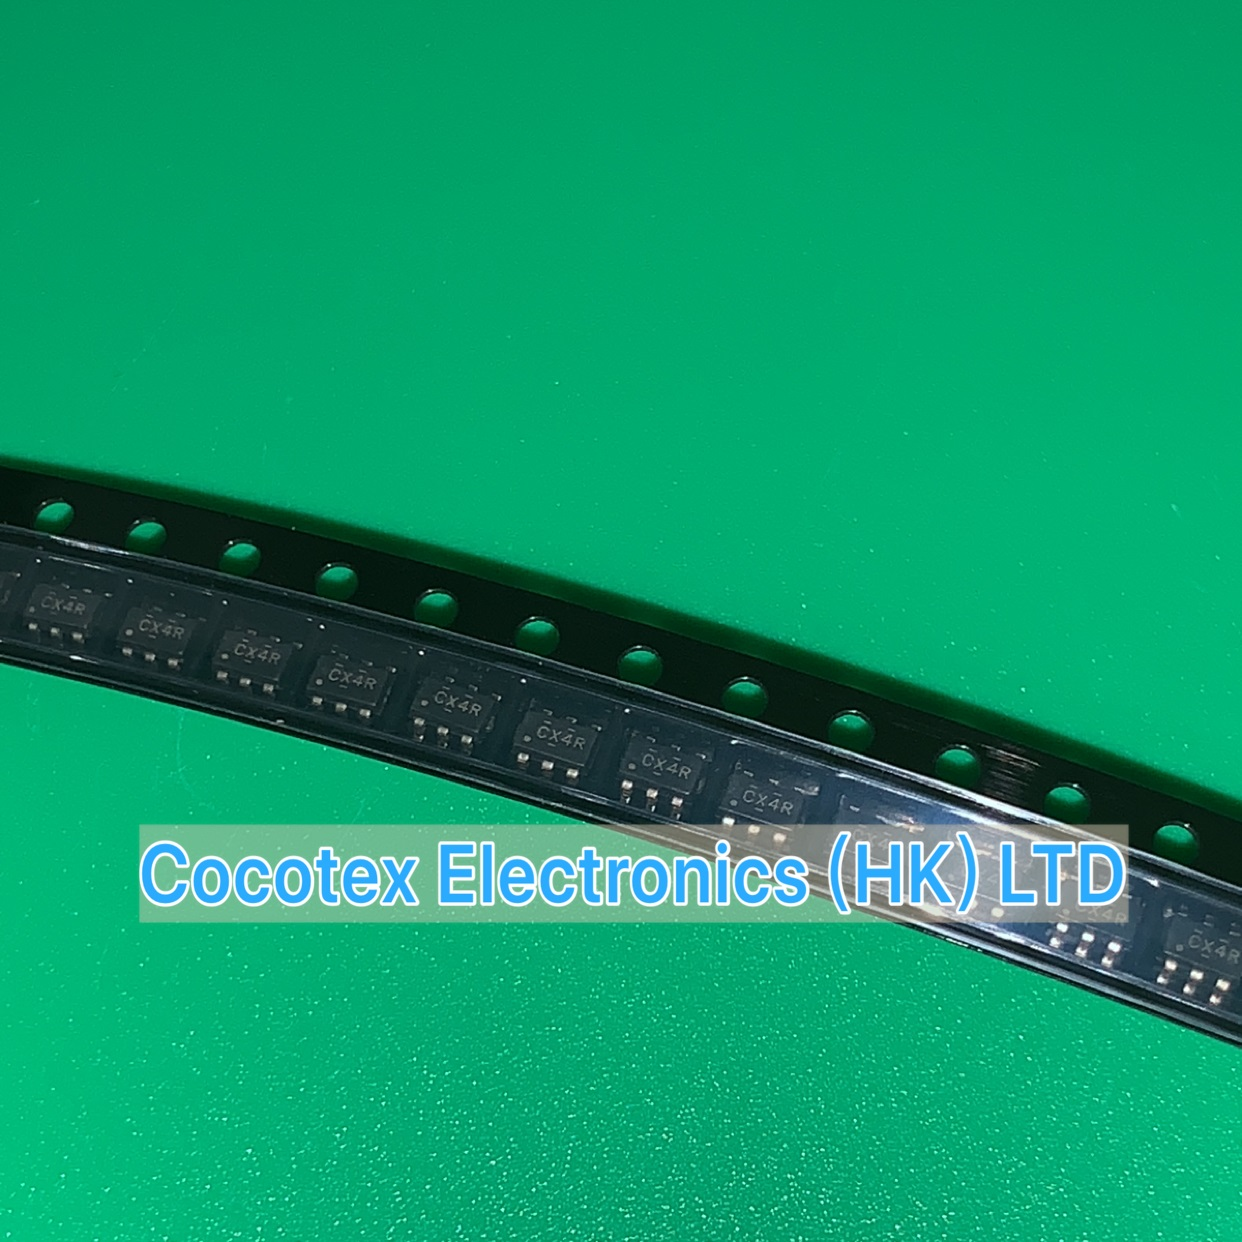 5pcs/lot SN74LVC1GX04DBVR SOT-23-6 CX4 SN 74LVC1GX04 DBVR CX4R CX45 IC CRYSTAL OSC DRIVER SOT23-6 SN74LVC1GX04DBVT